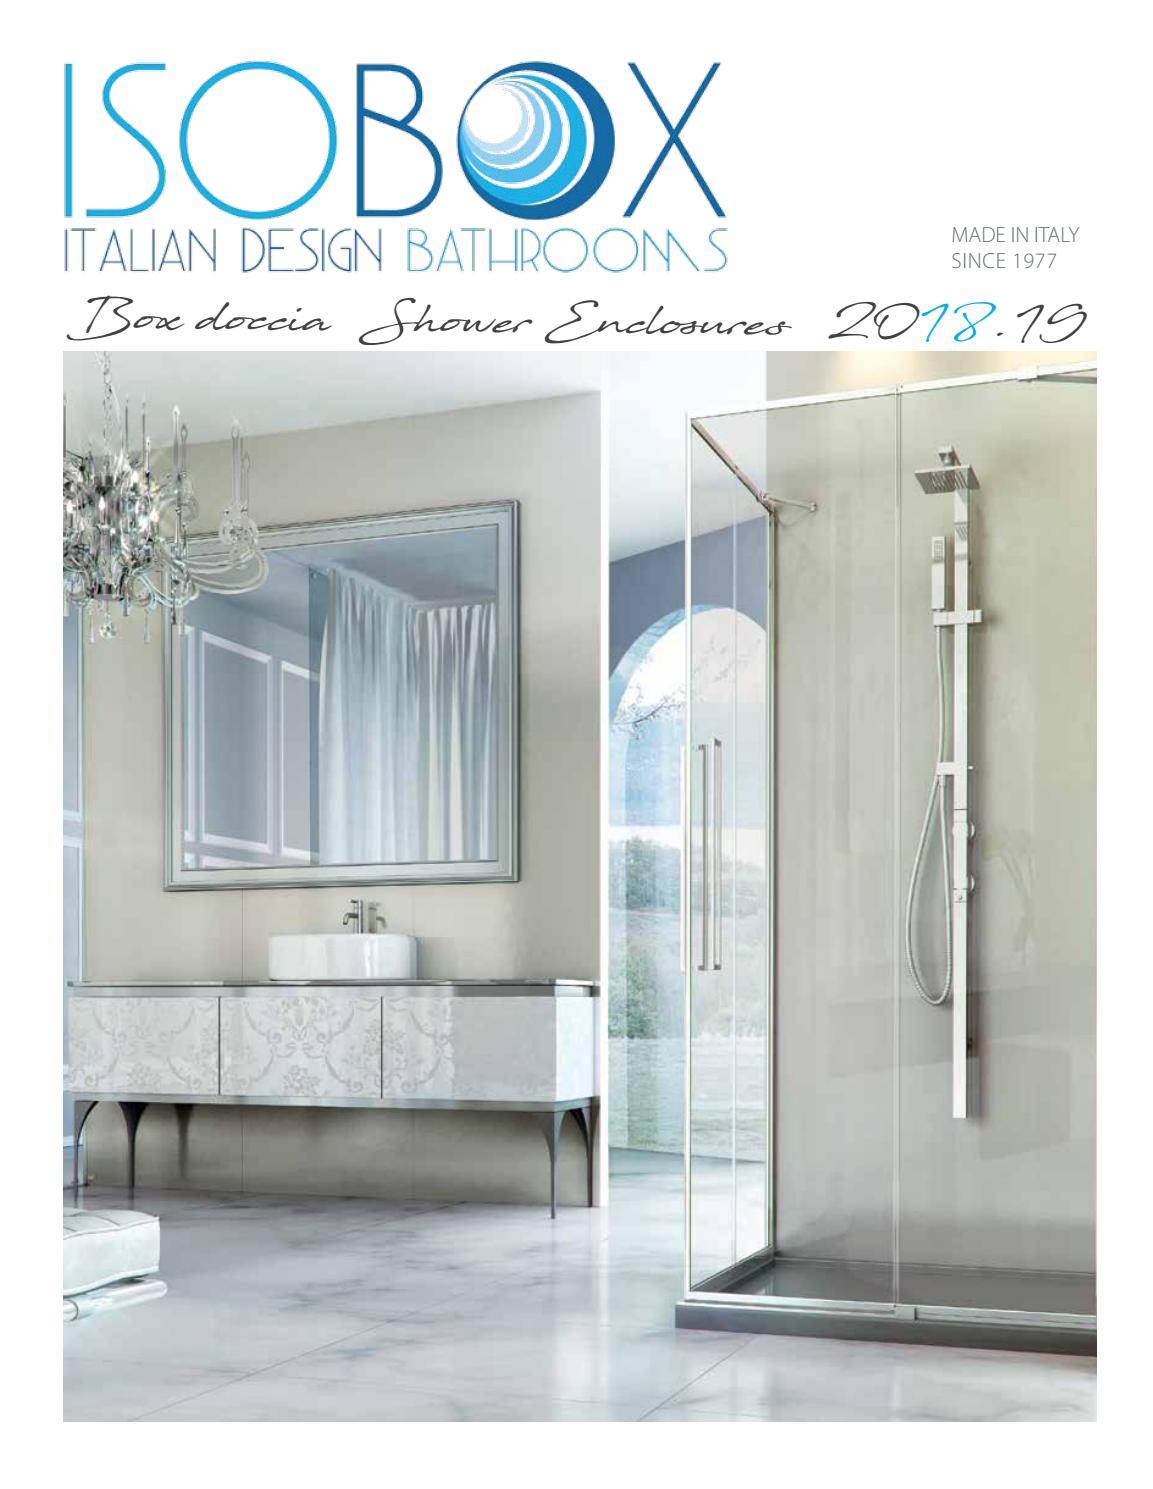 Vente chaude 2019 joli design complet dans les spécifications CATALOGO ISOBOX 2018-2019 box doccia / ISOBOX CATALOGUE 2018 ...